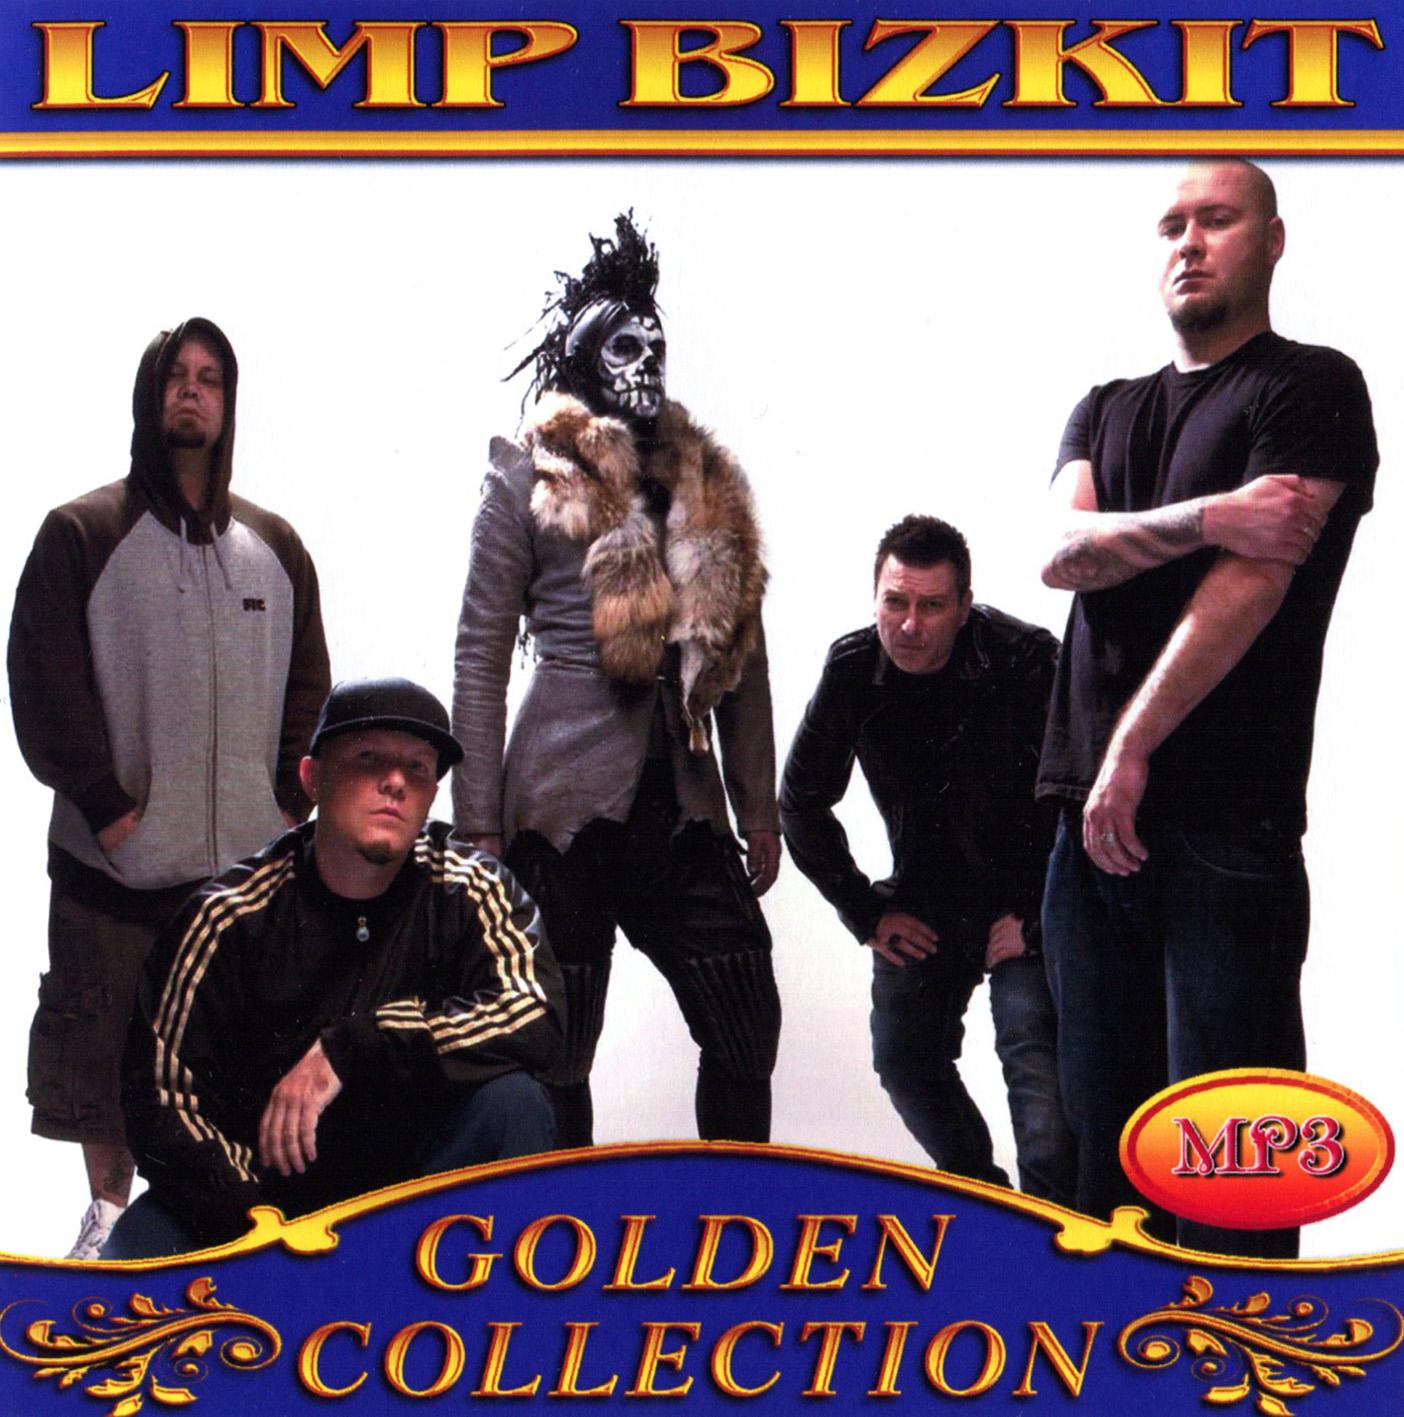 Limp Bizkit [mp3]